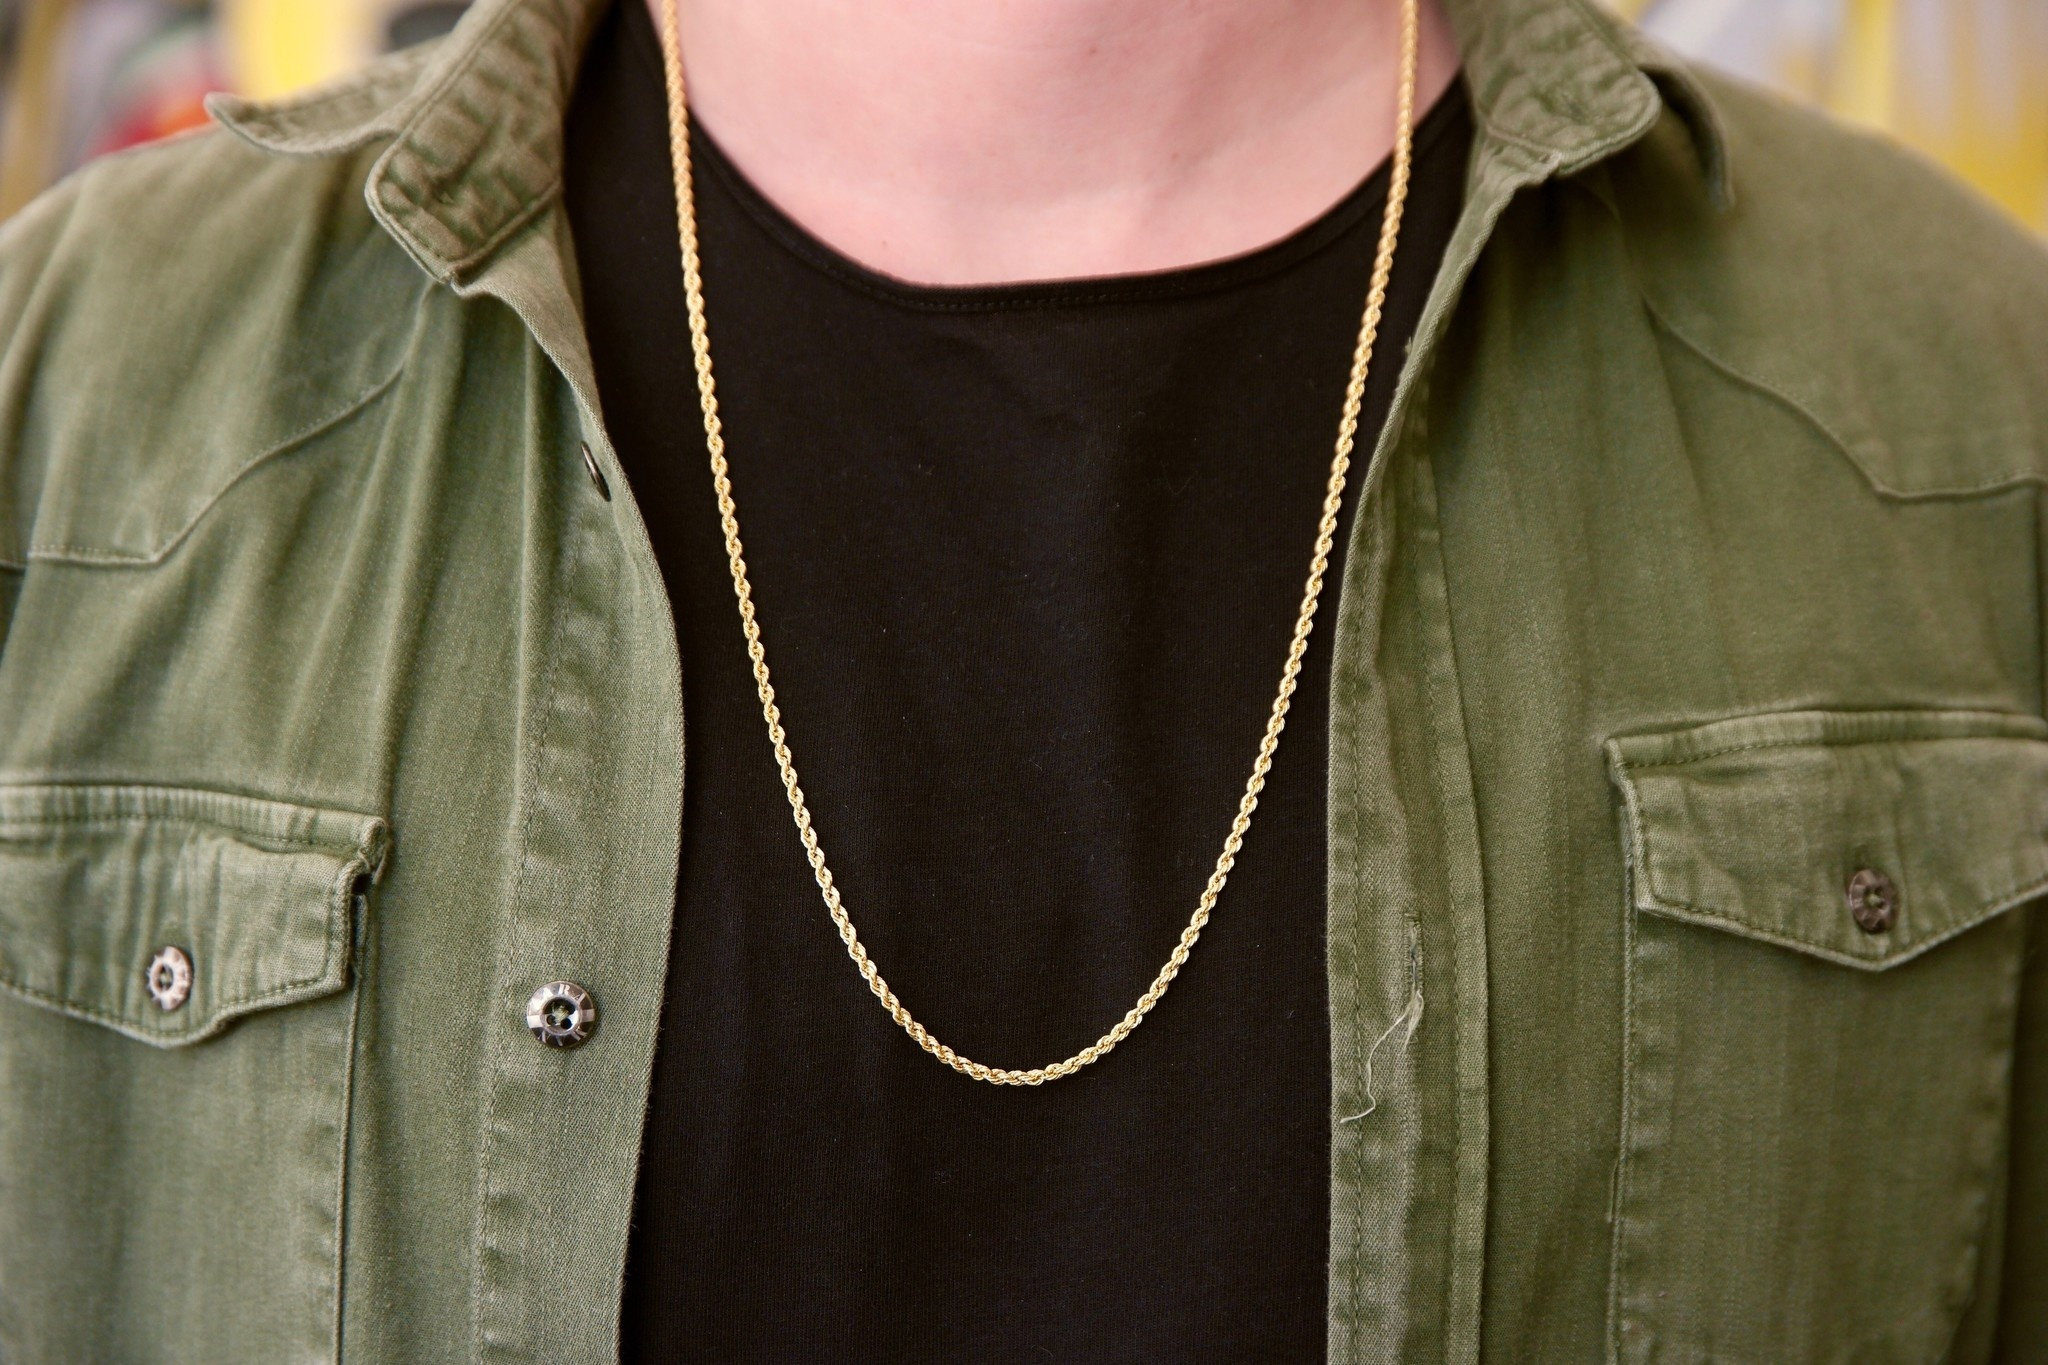 Rope chain ketting massief goud 14 kt 2.5 mm-2